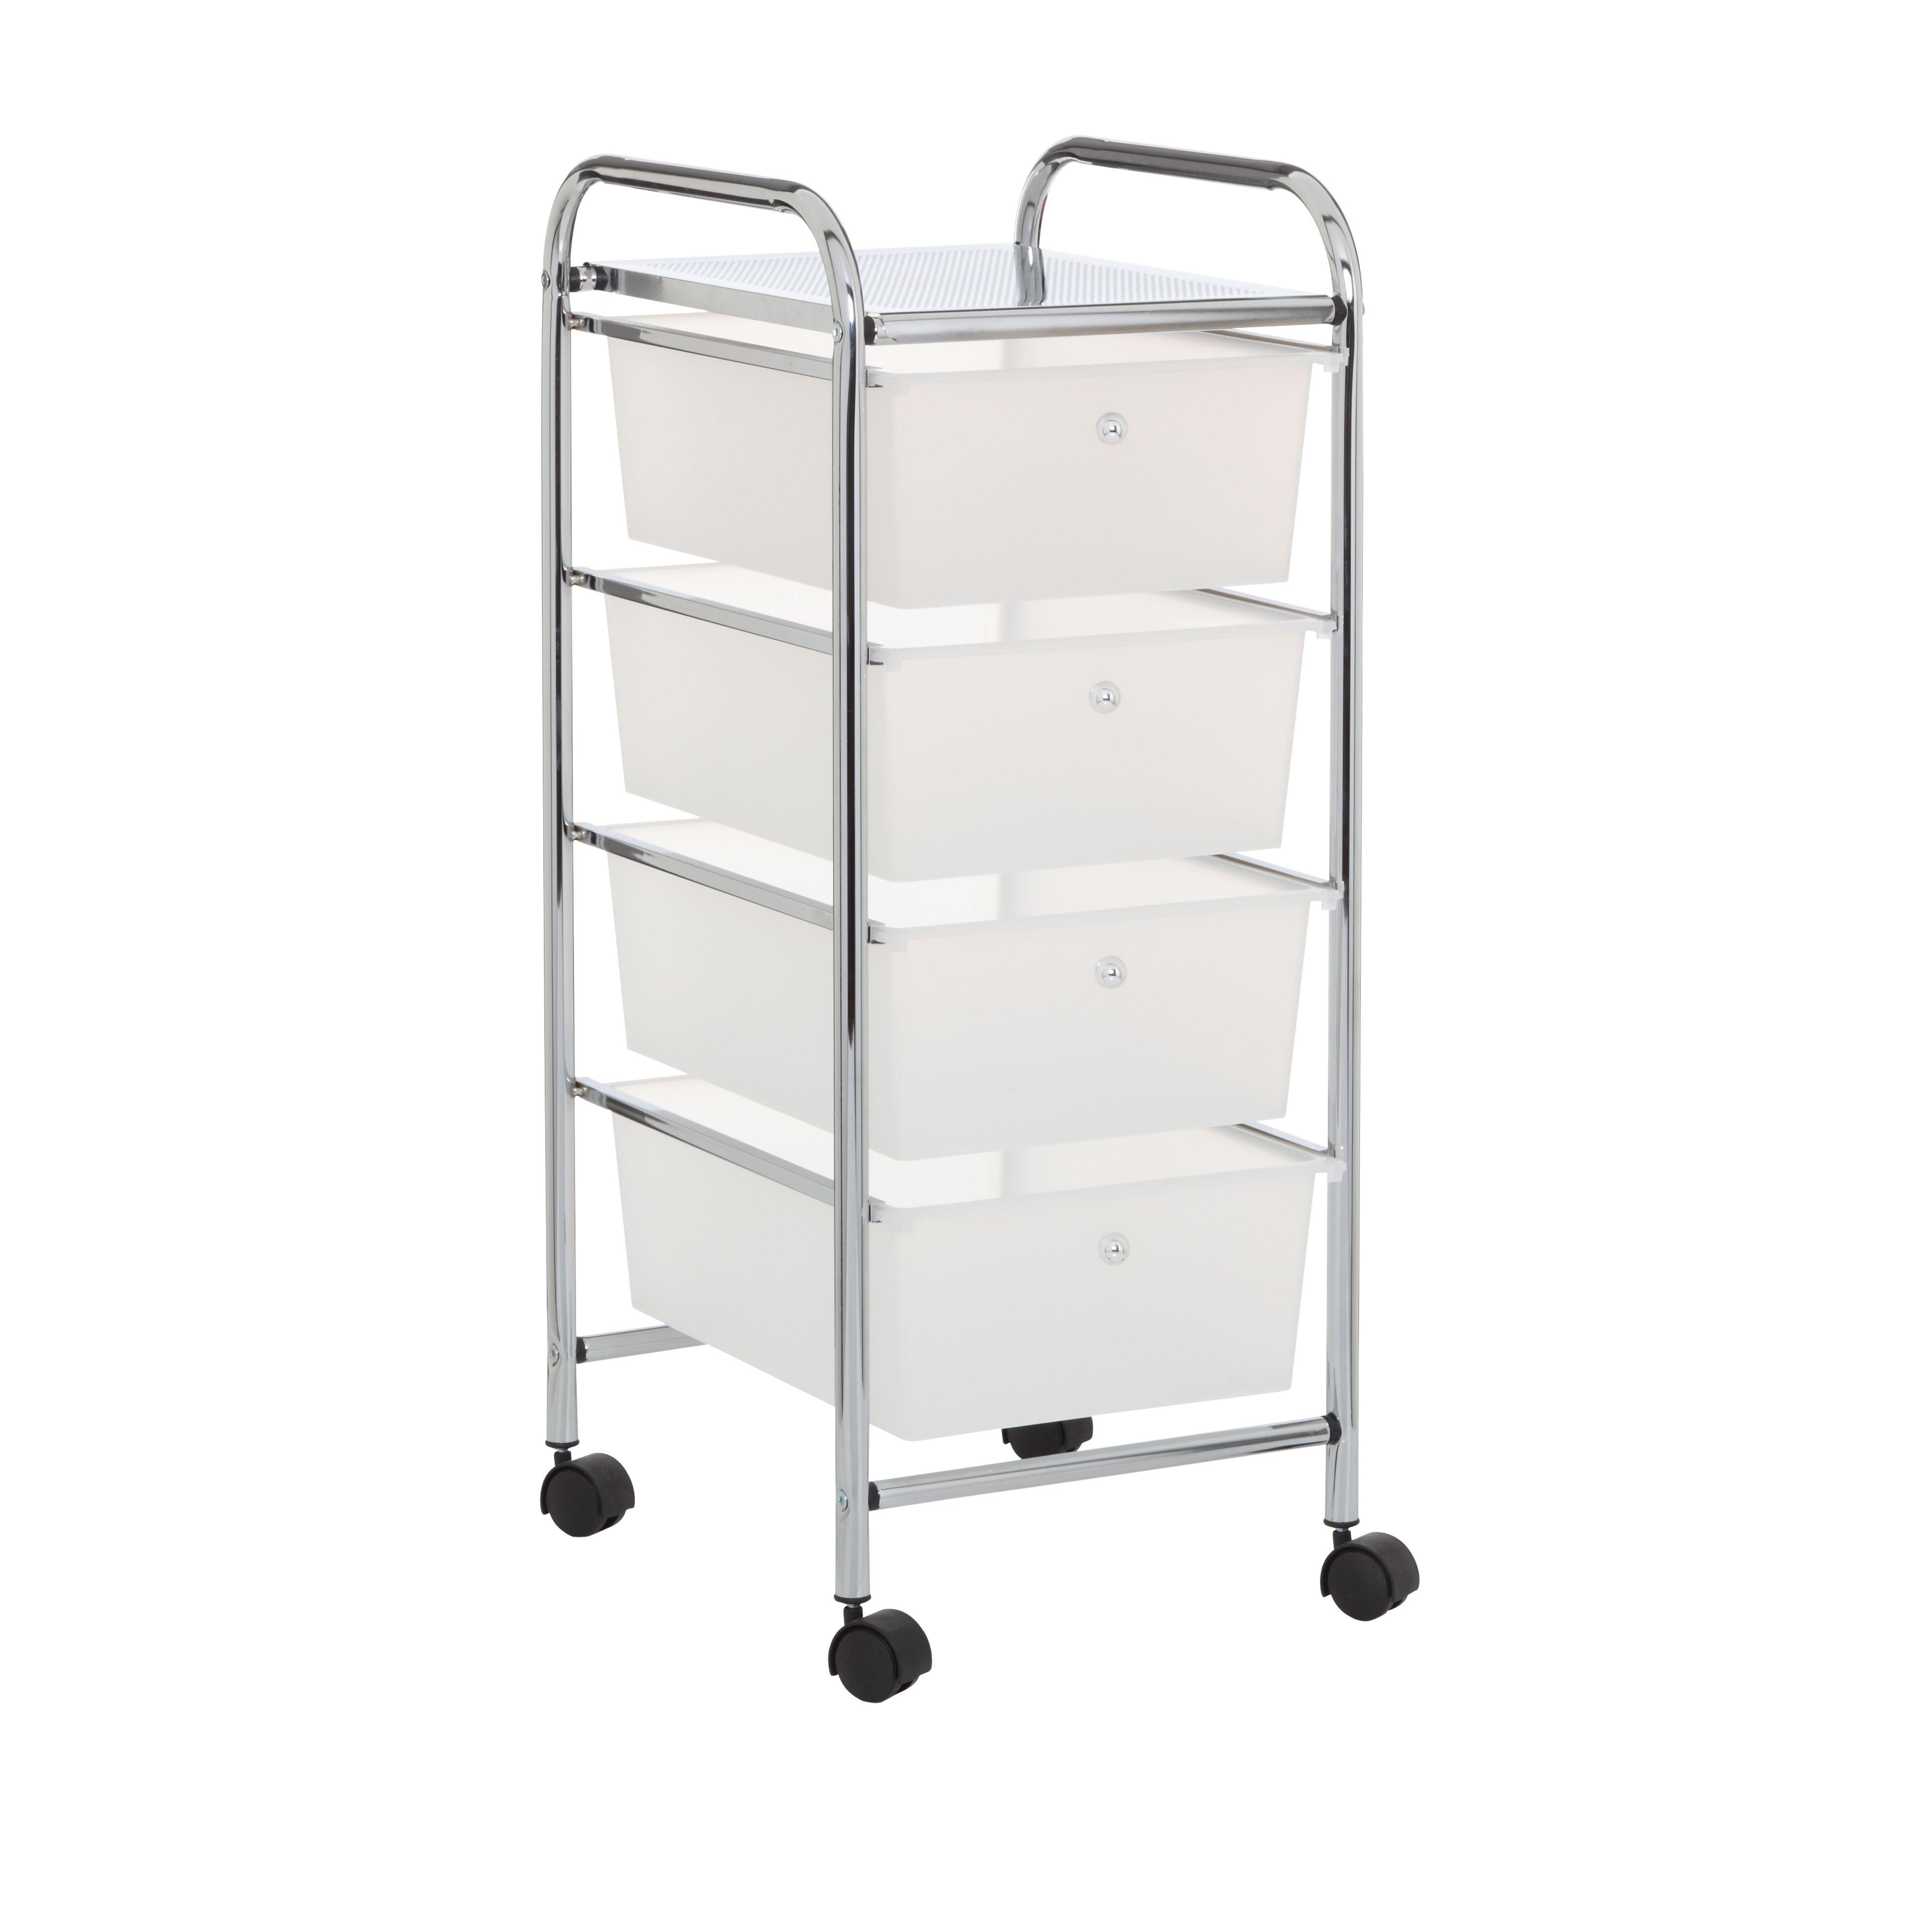 Carrito 4 alturas con cestas de plástico Carrito estrecho de 4 ...